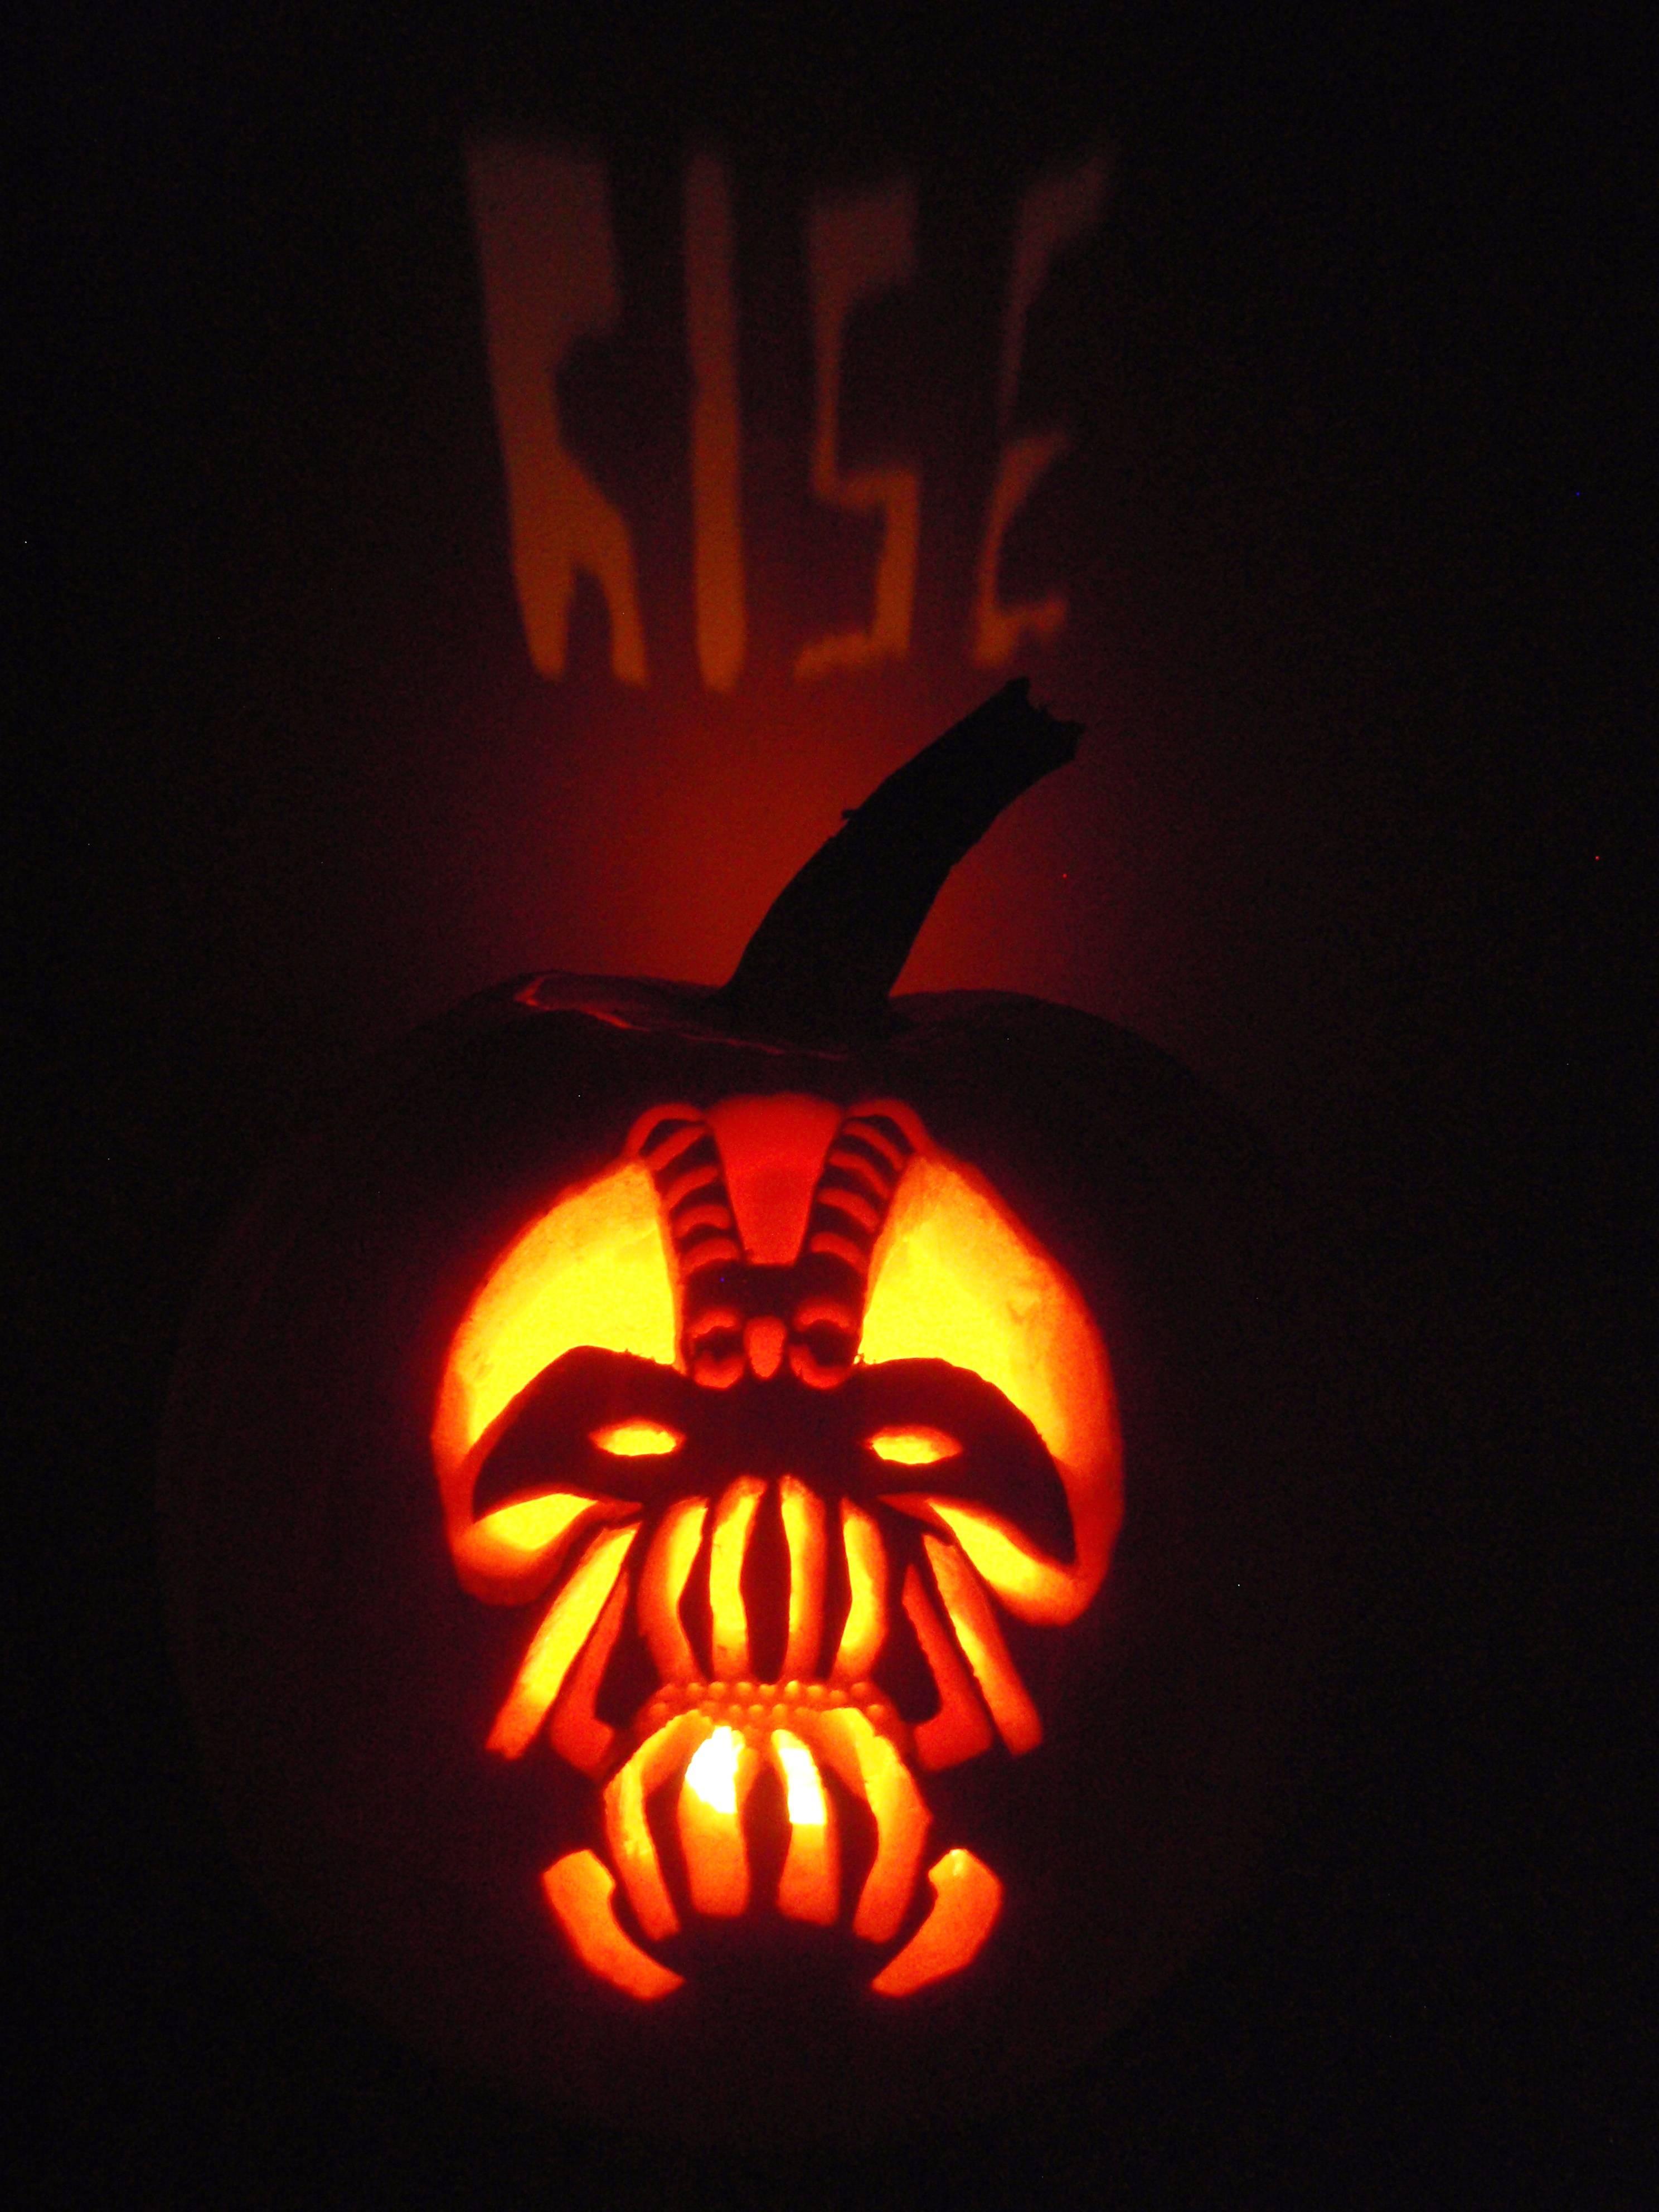 Dark Knight Pumpkin Carving Patterns Dark Knight Rises Bane Pumpkin